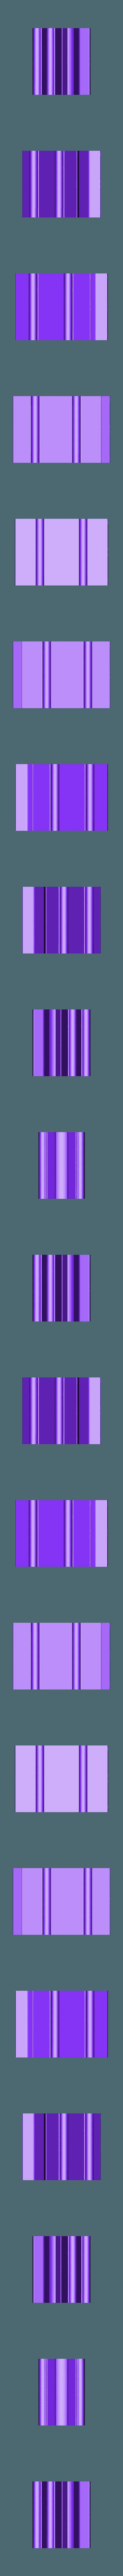 LPT3K_peg.stl Download free STL file Ladder Peg Toy 3000: Codename Overkill • 3D printing object, ecoiras